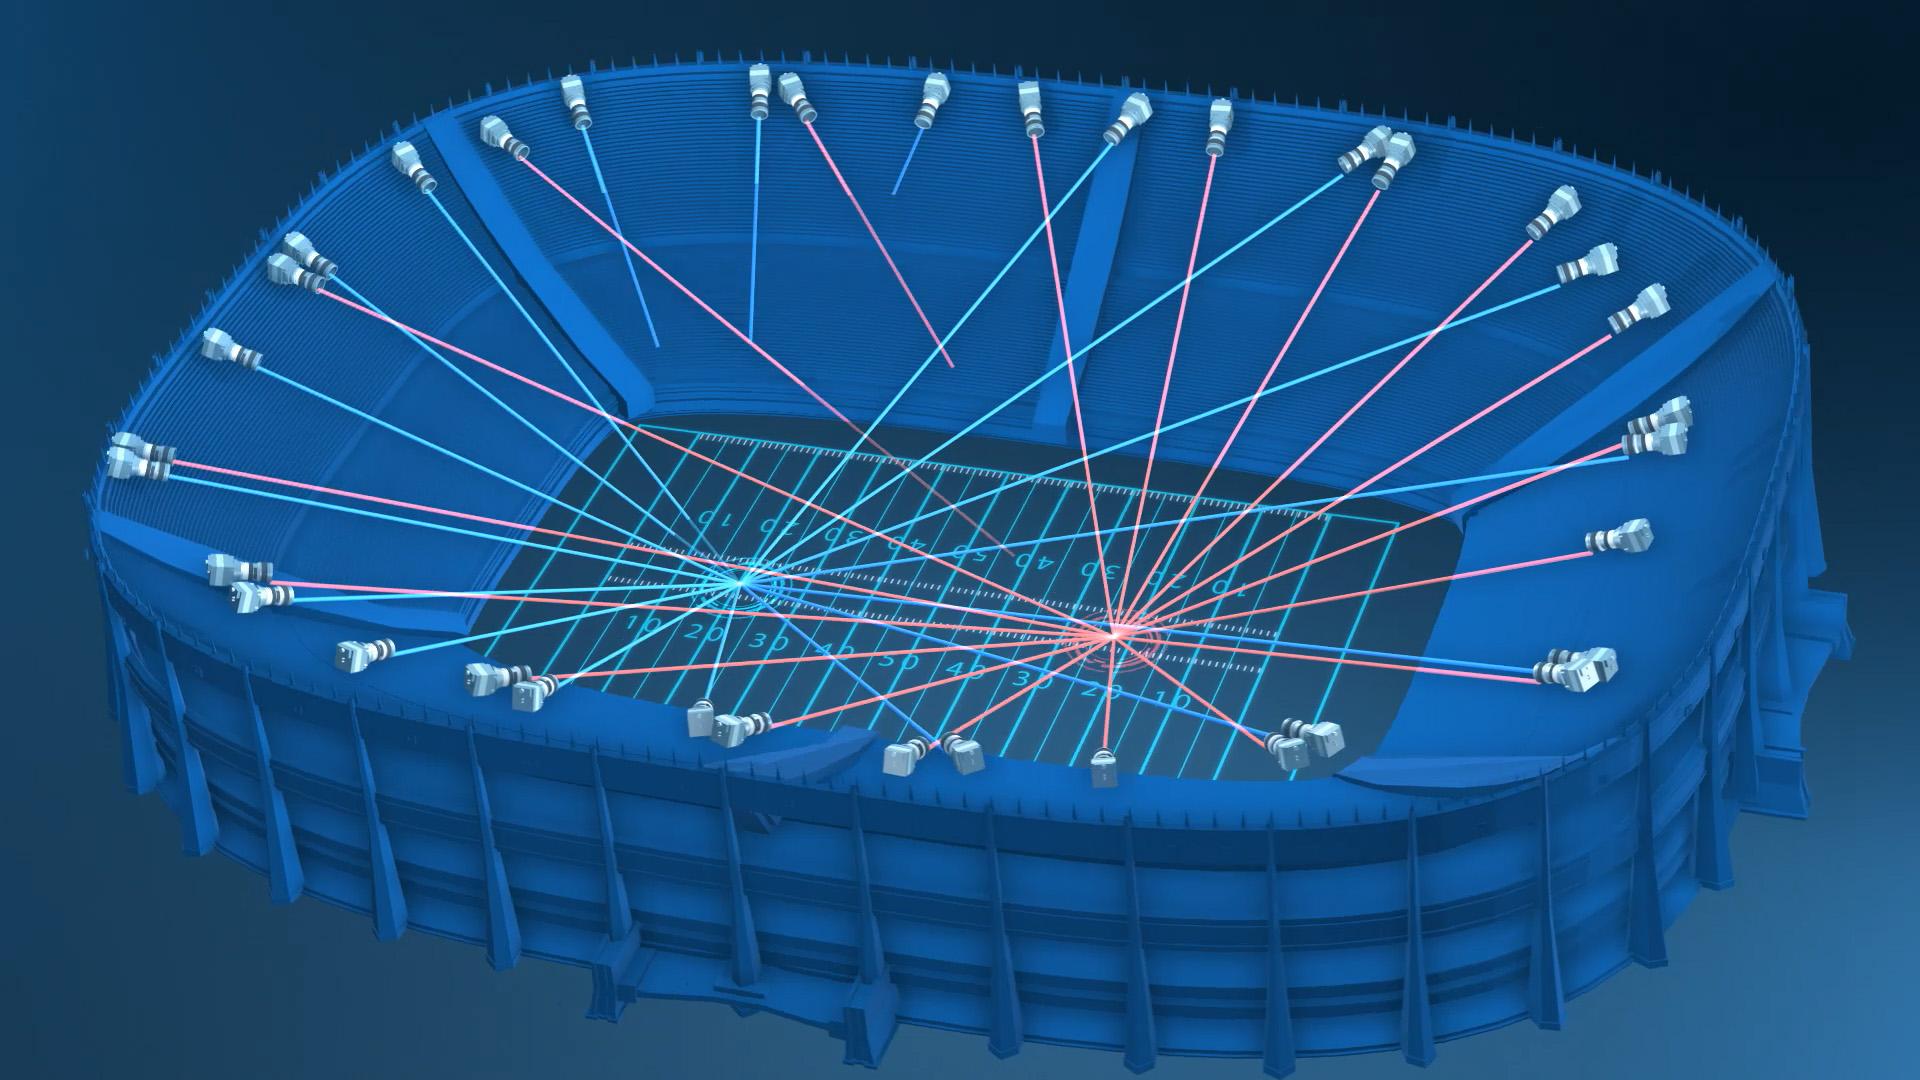 StadiumGraphic.jpg